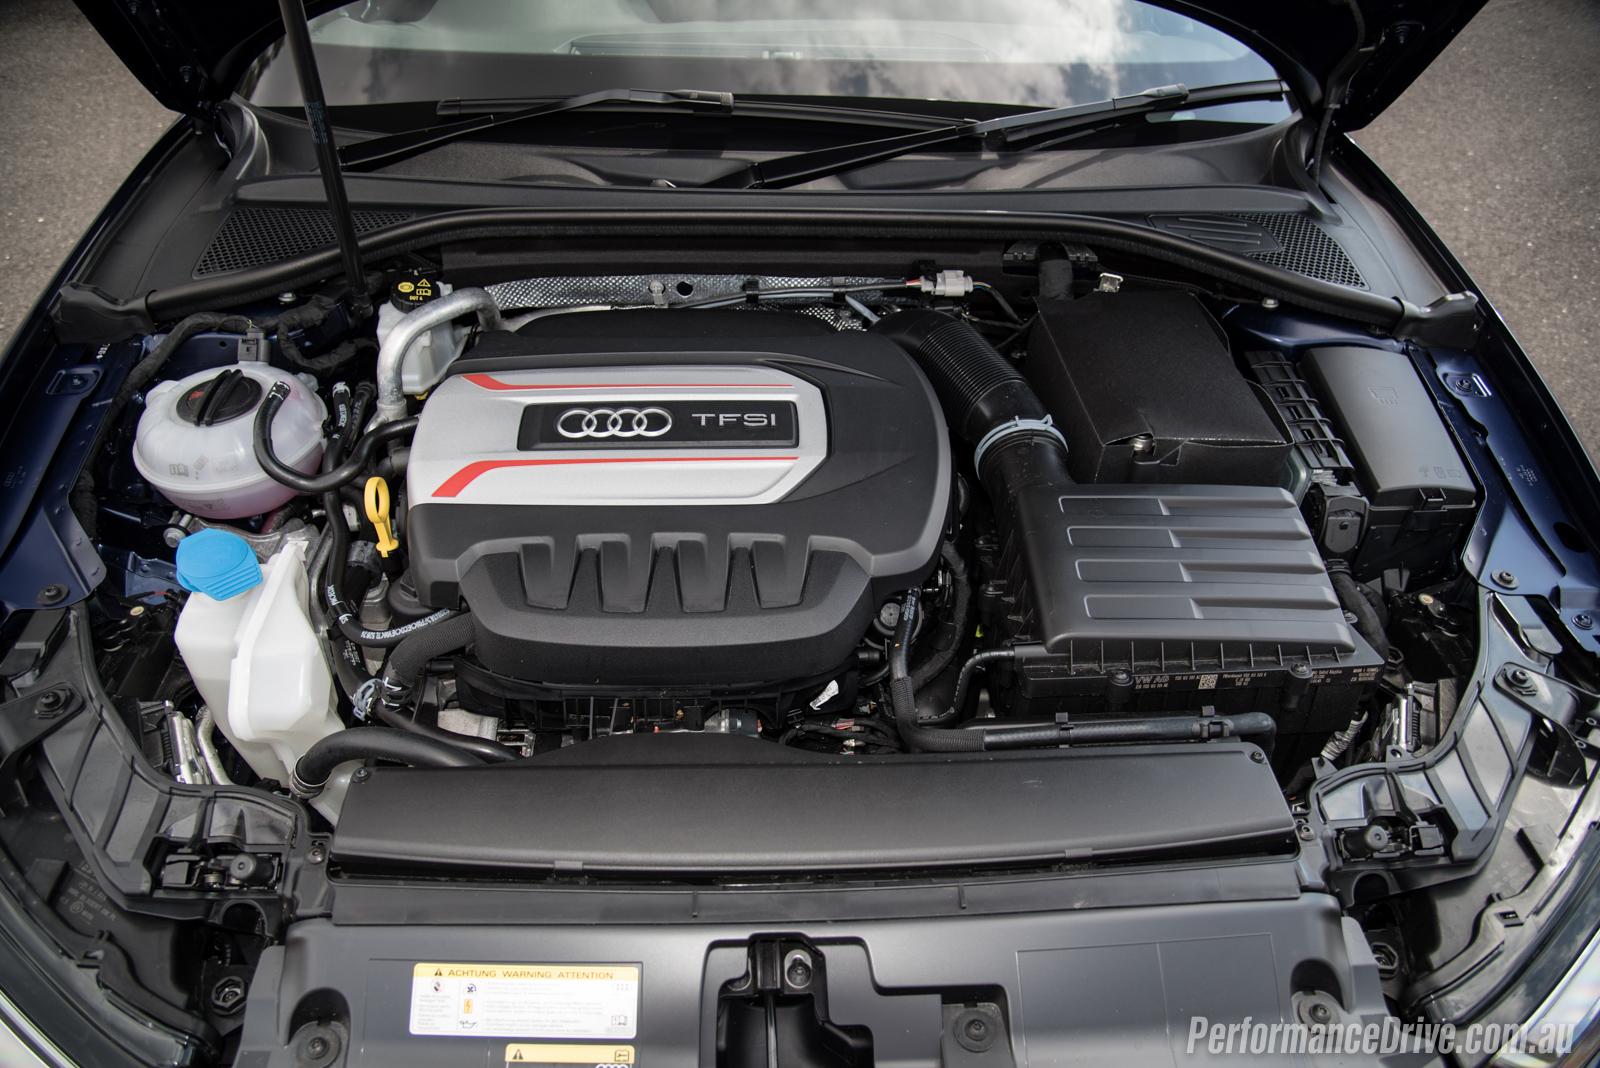 Audi S Sedan Review Video PerformanceDrive - Audi s3 engine